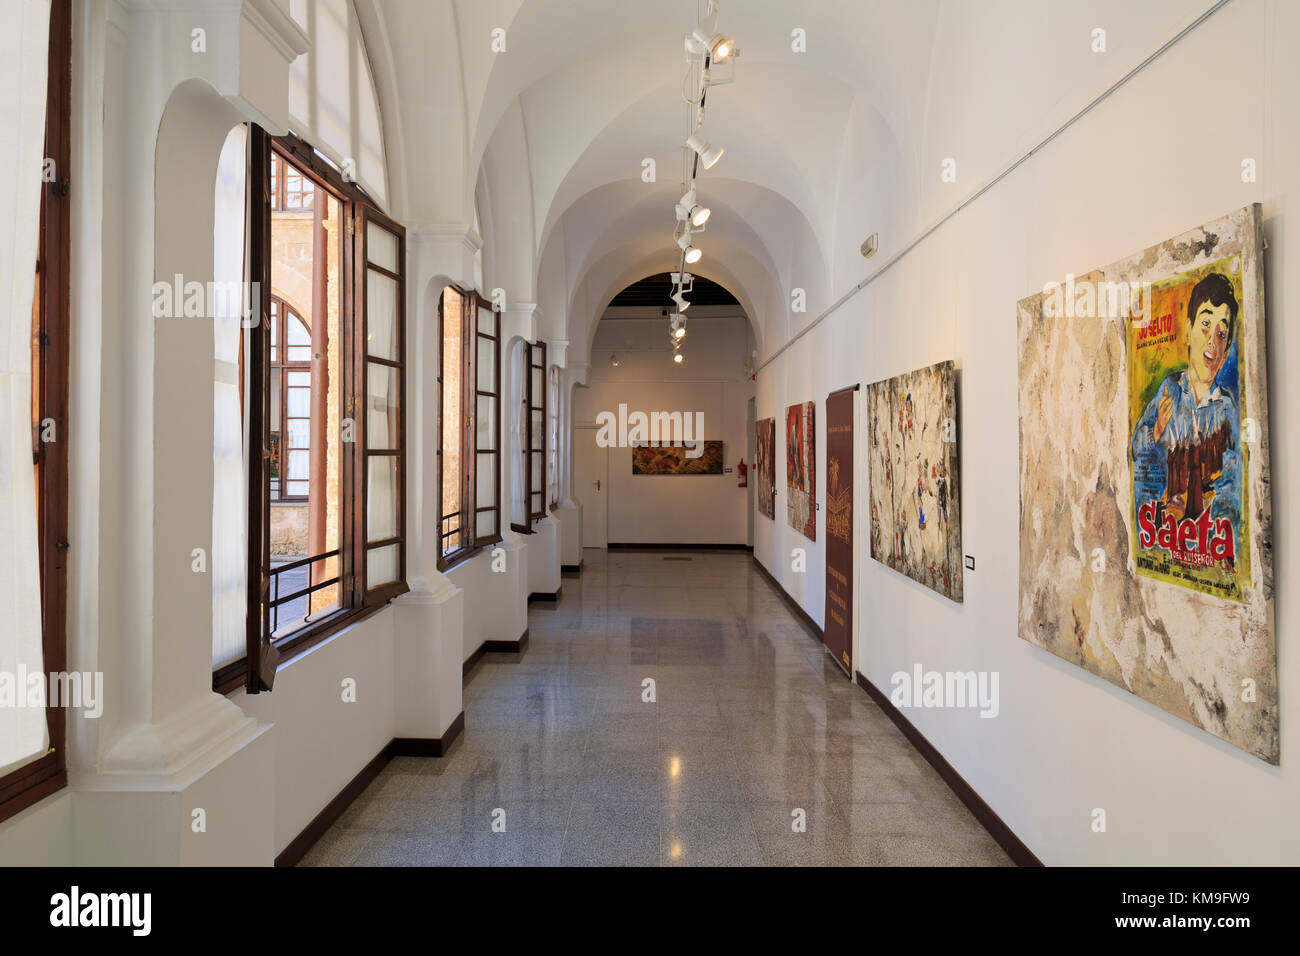 Centro De Historia Y Cultura Militar De Balearas, Palma De Mallorca, Majorca, Belearic Islands, Spain, Europe - Stock Image